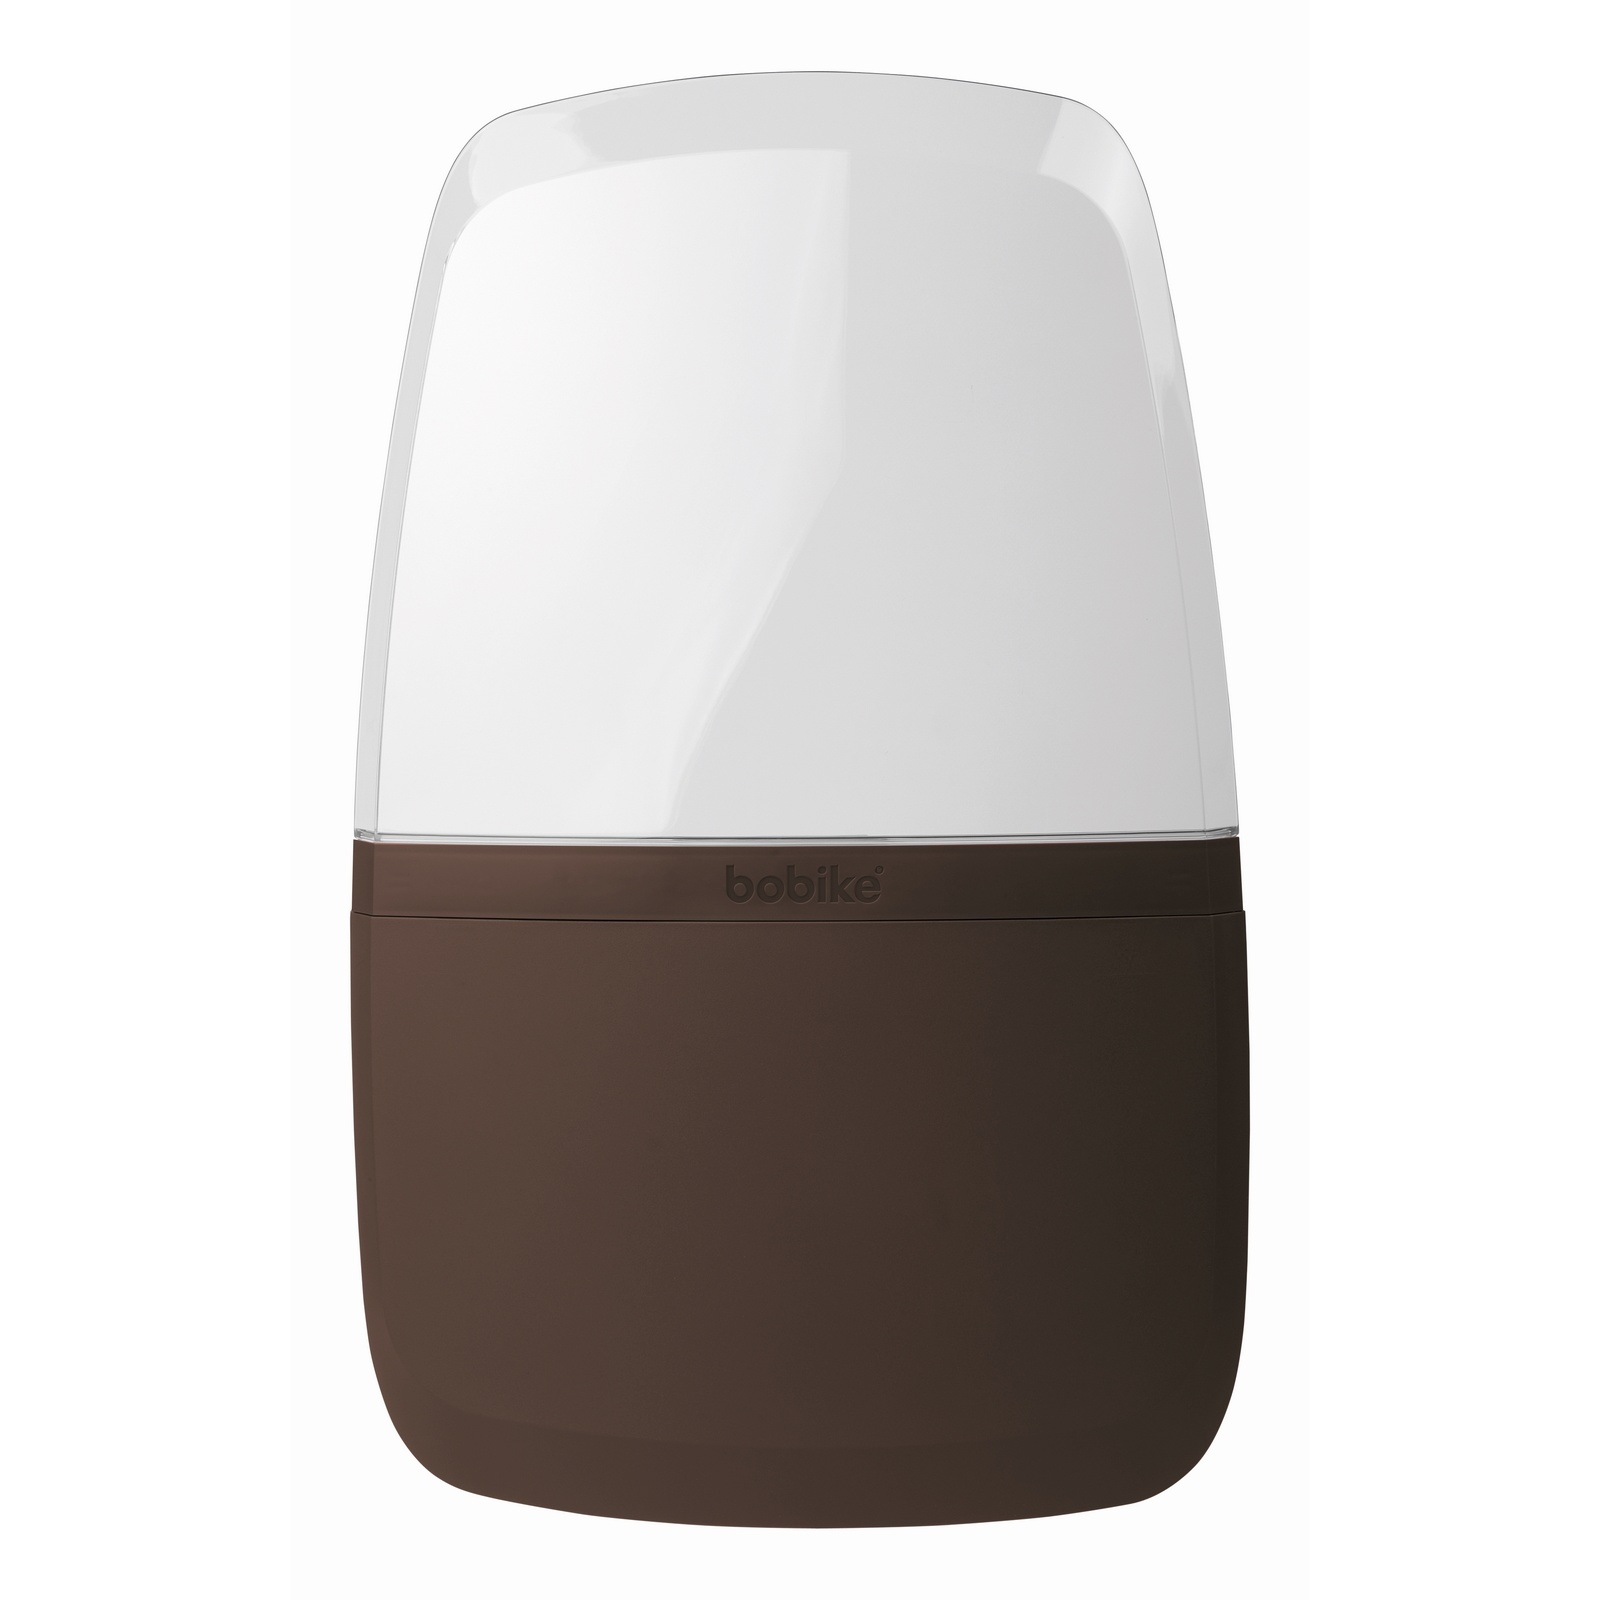 Mini Exclusive Plus Toffee Brown windscherm